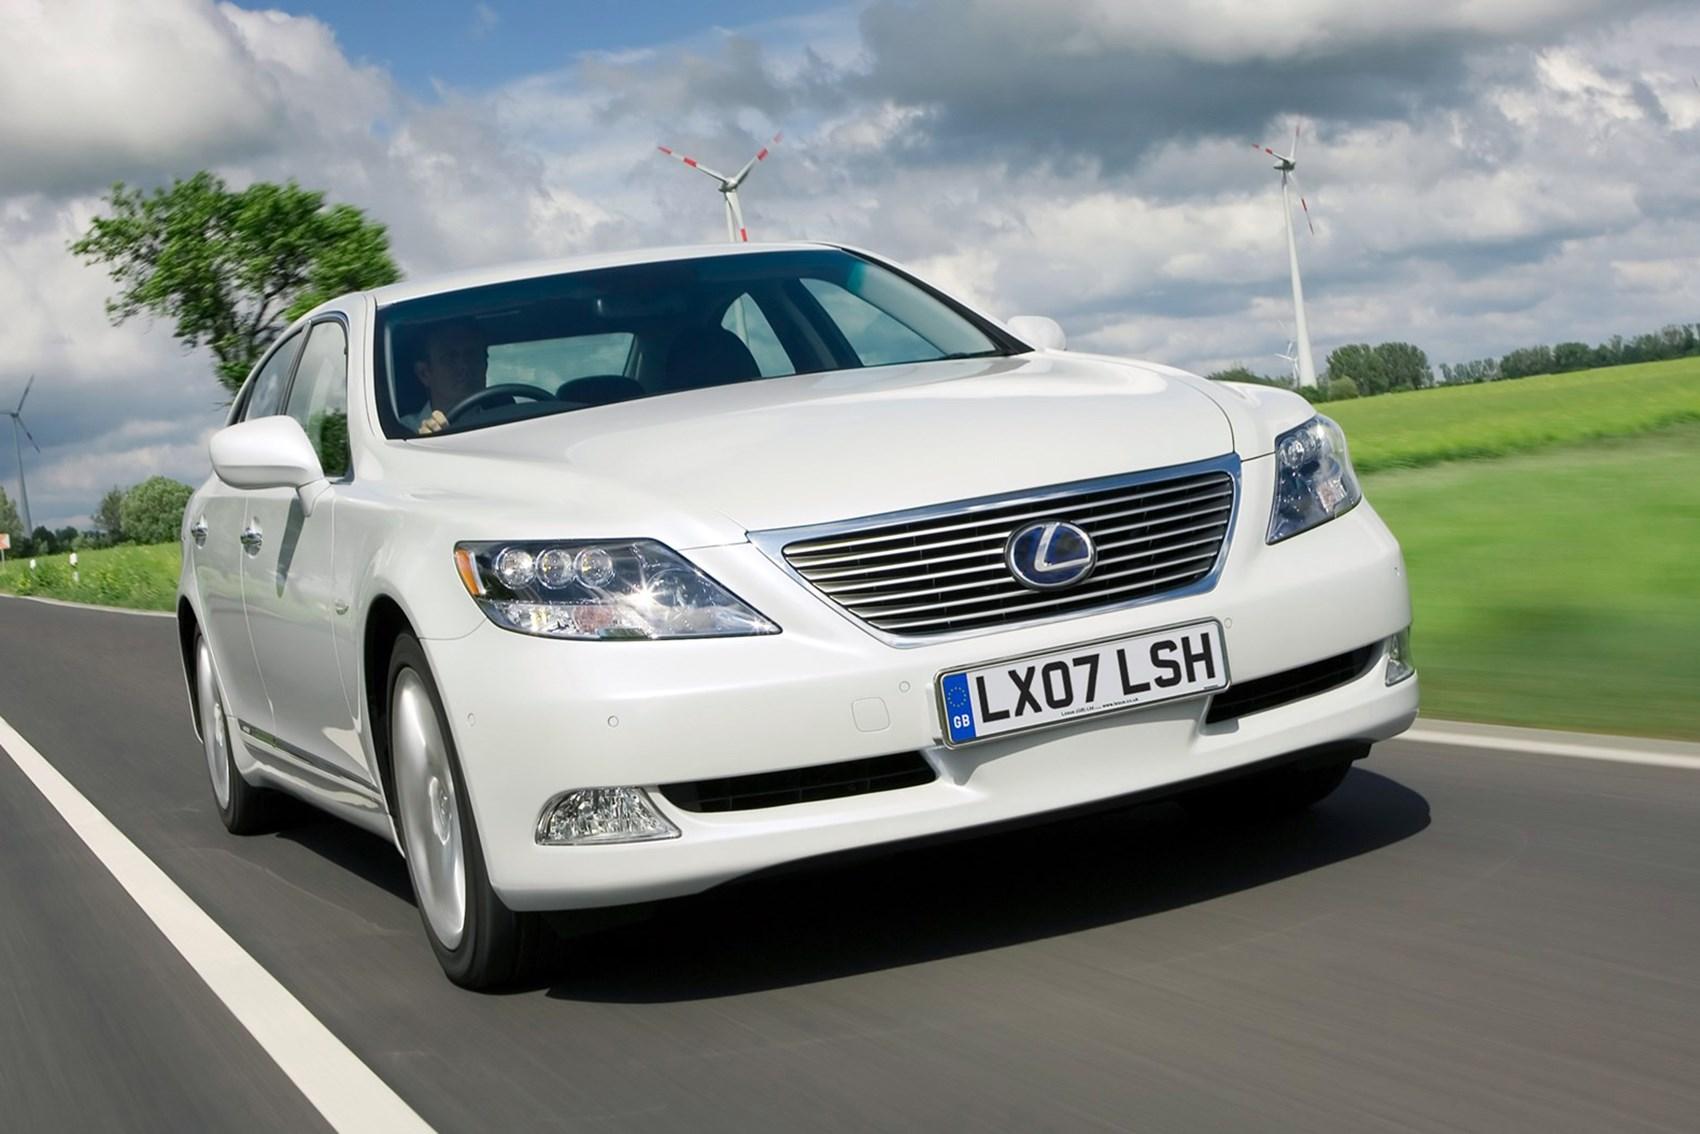 Lexus LS - luxury cars for less than £10k